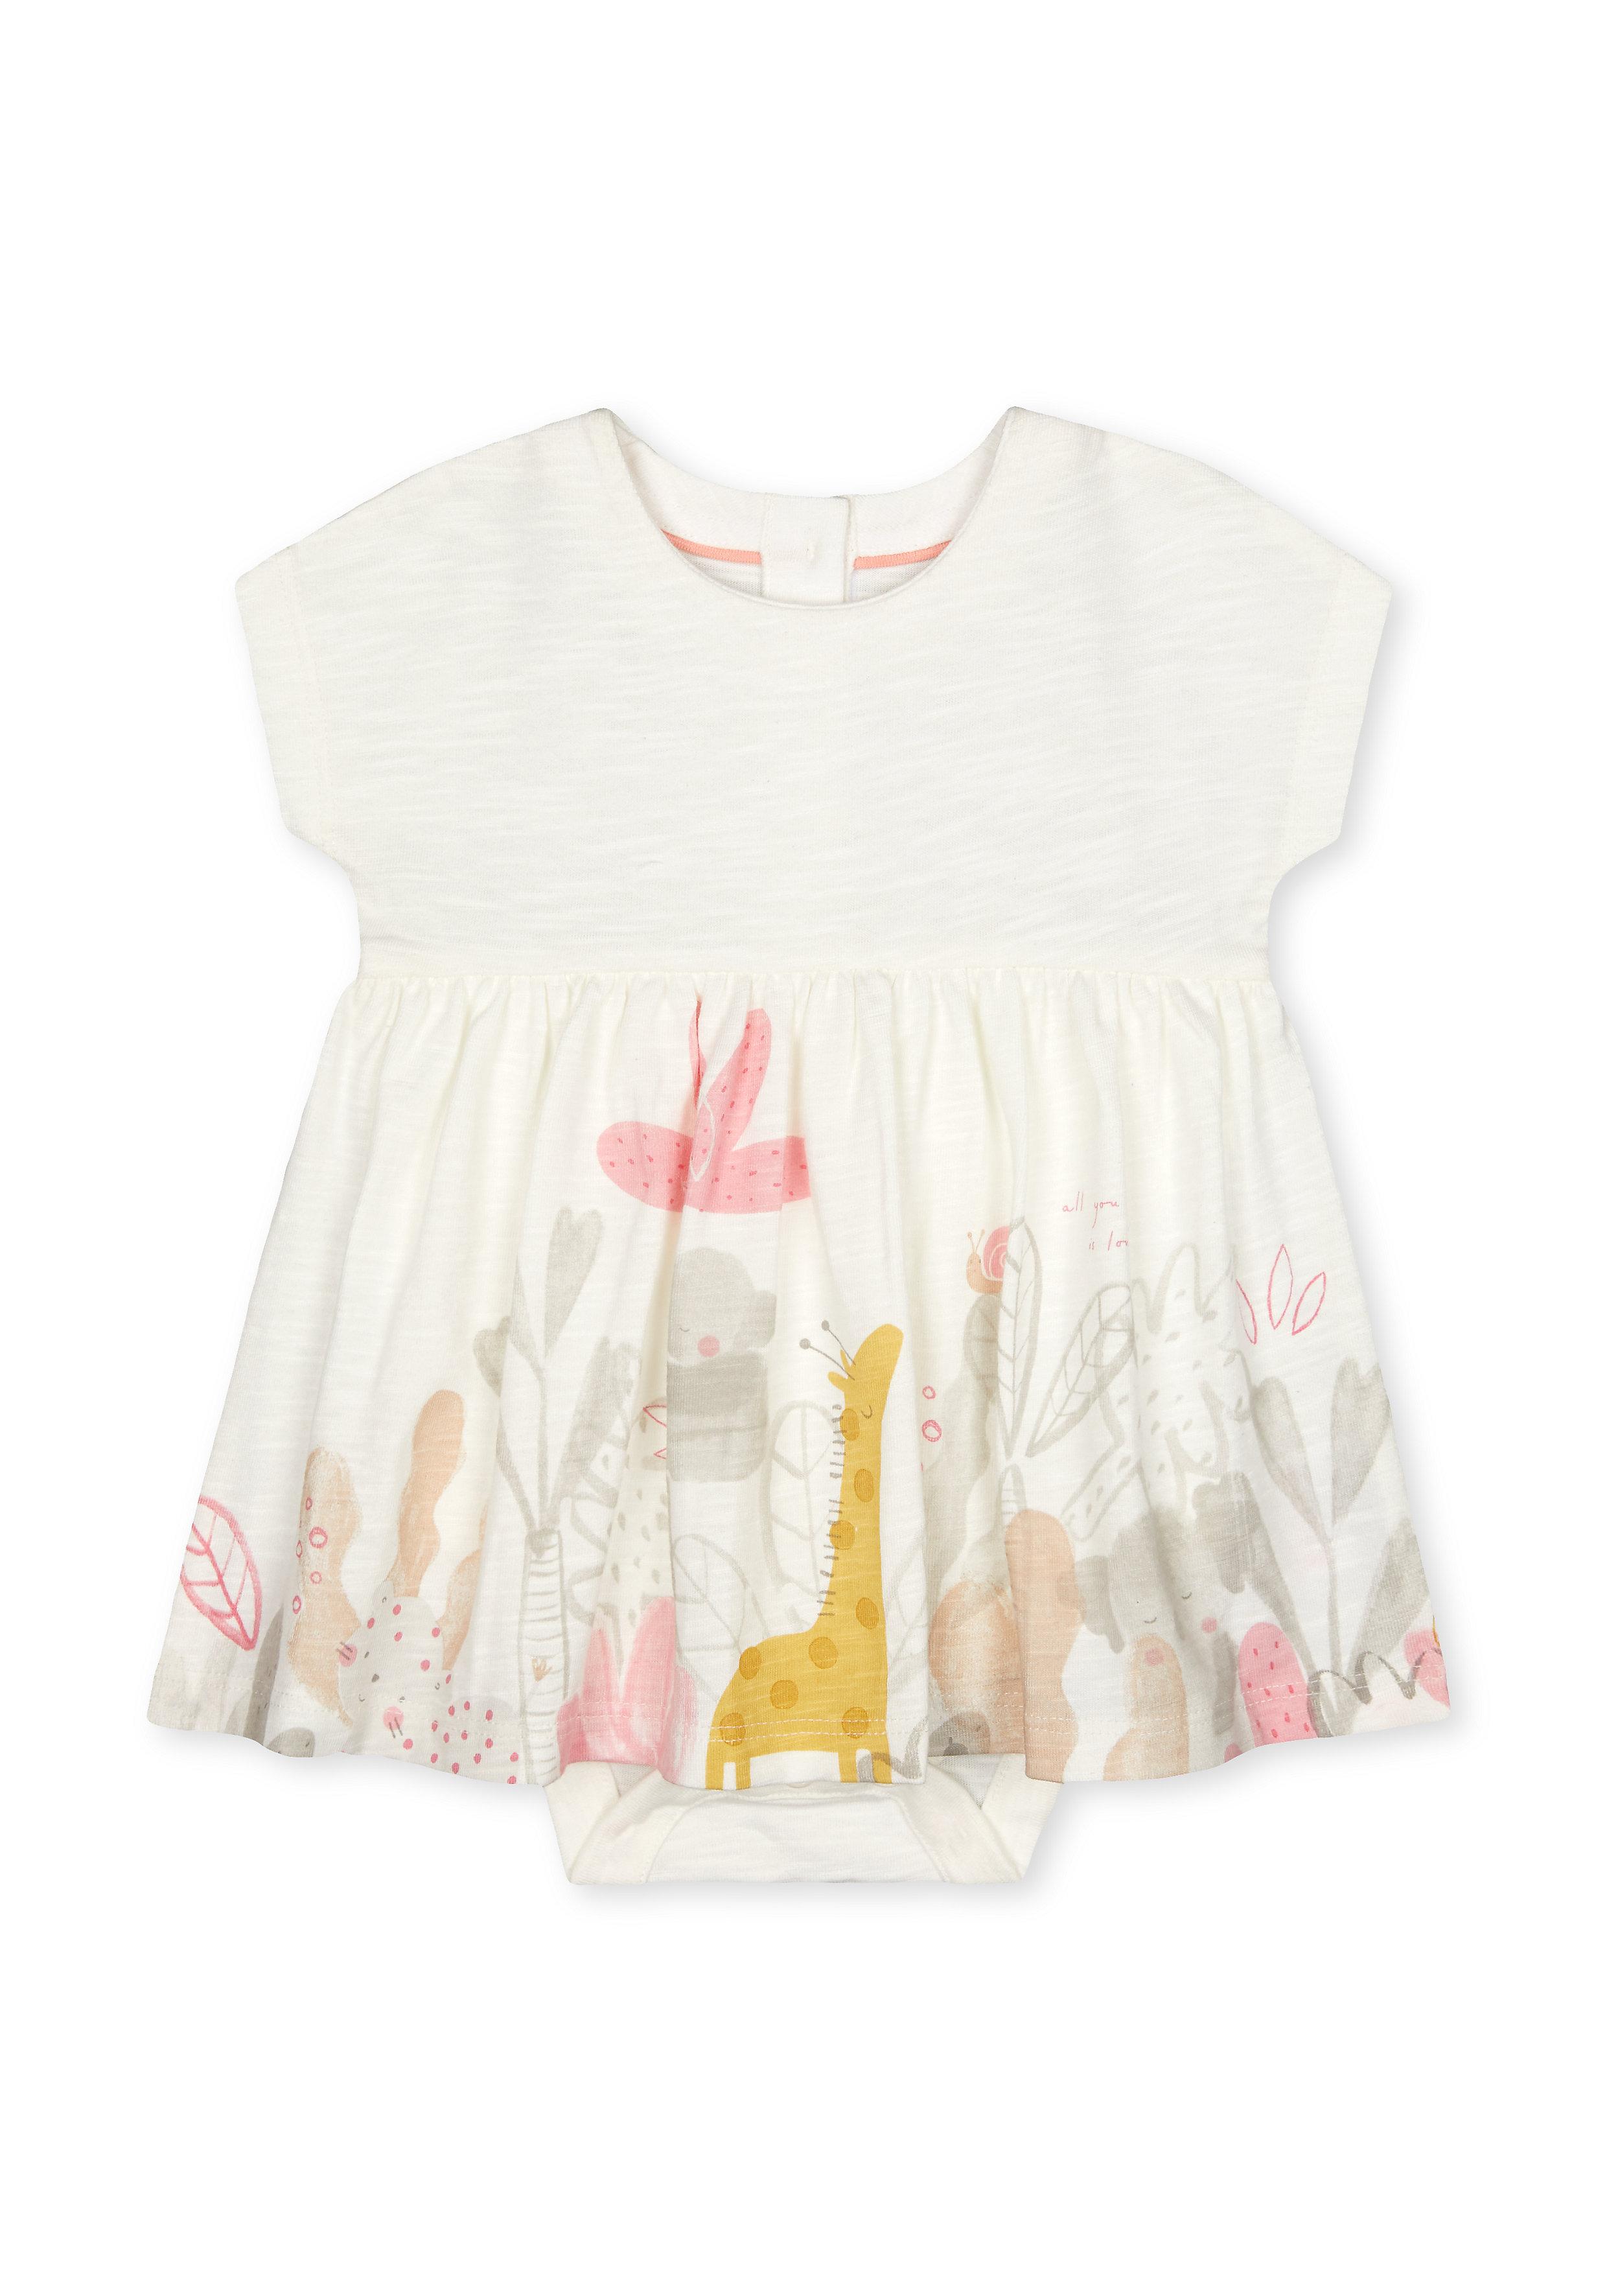 Mothercare | Girls Half Sleeves Dress Animal Print - Cream